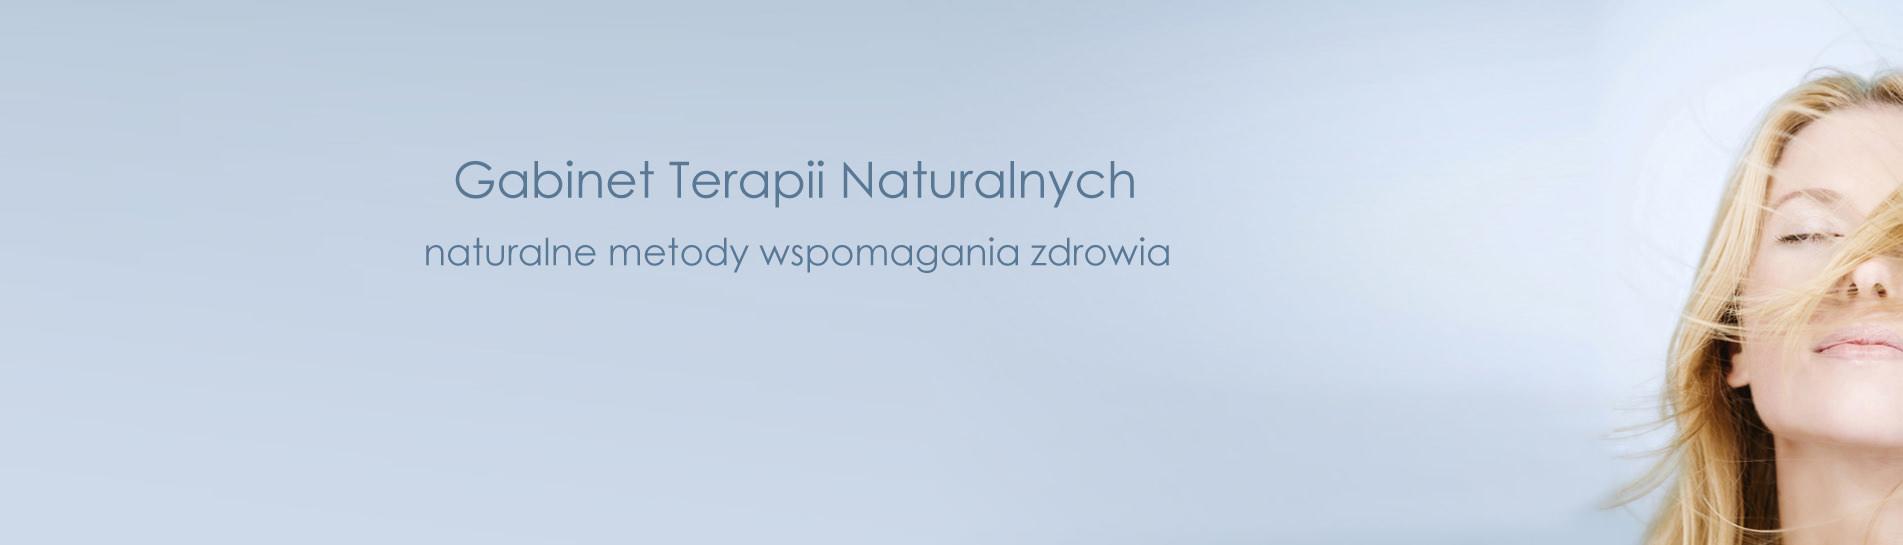 Filozofia Zdrowia - Gabinet medycyny naturalnej Łódx